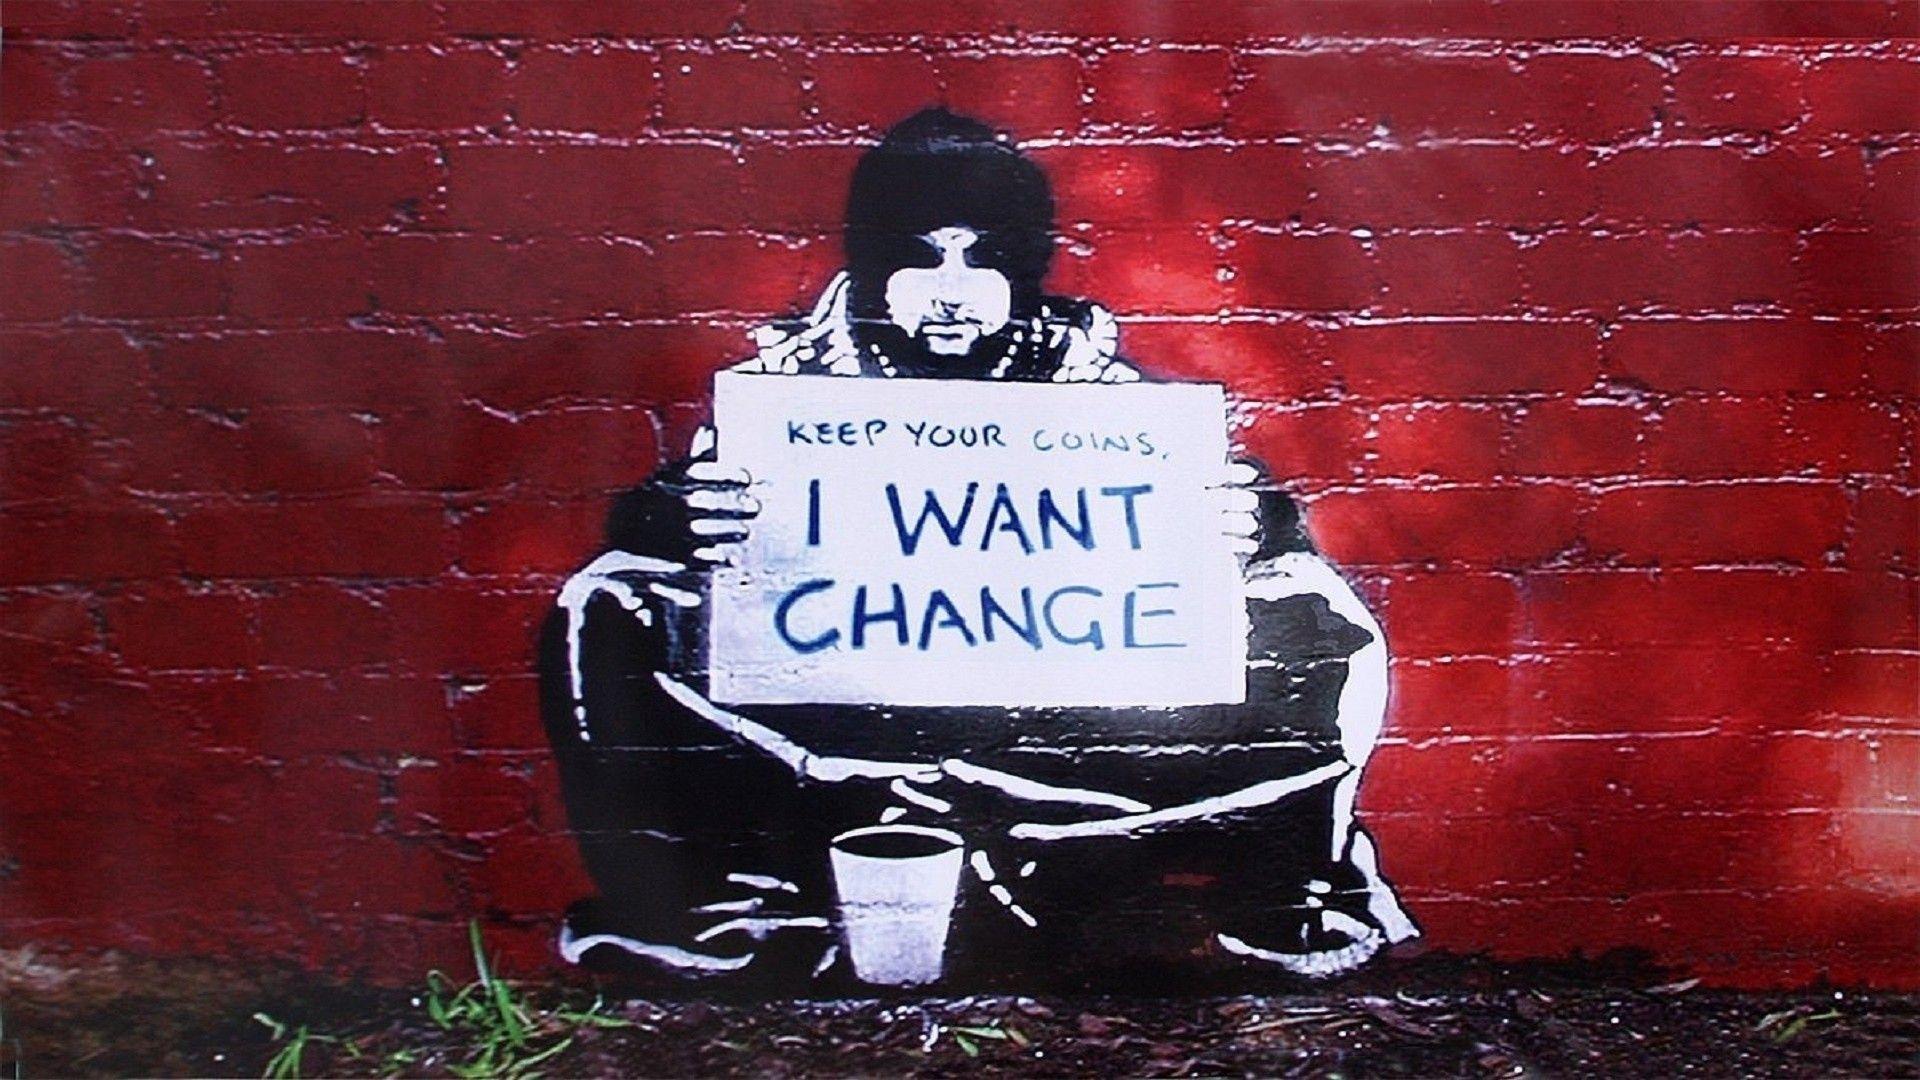 wall street art wallpapers hd